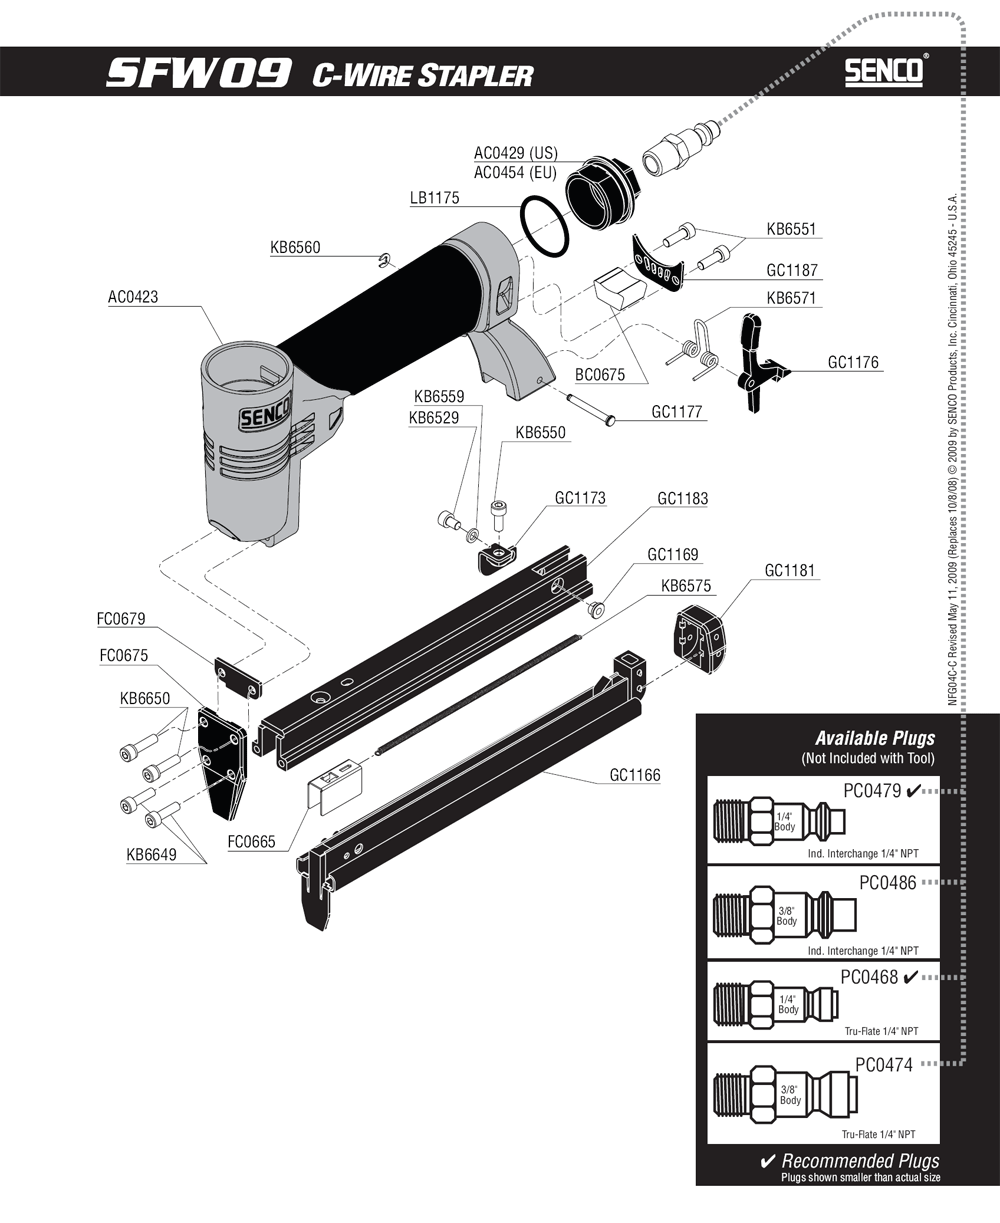 4C0071N-senco-PB-1Break Down